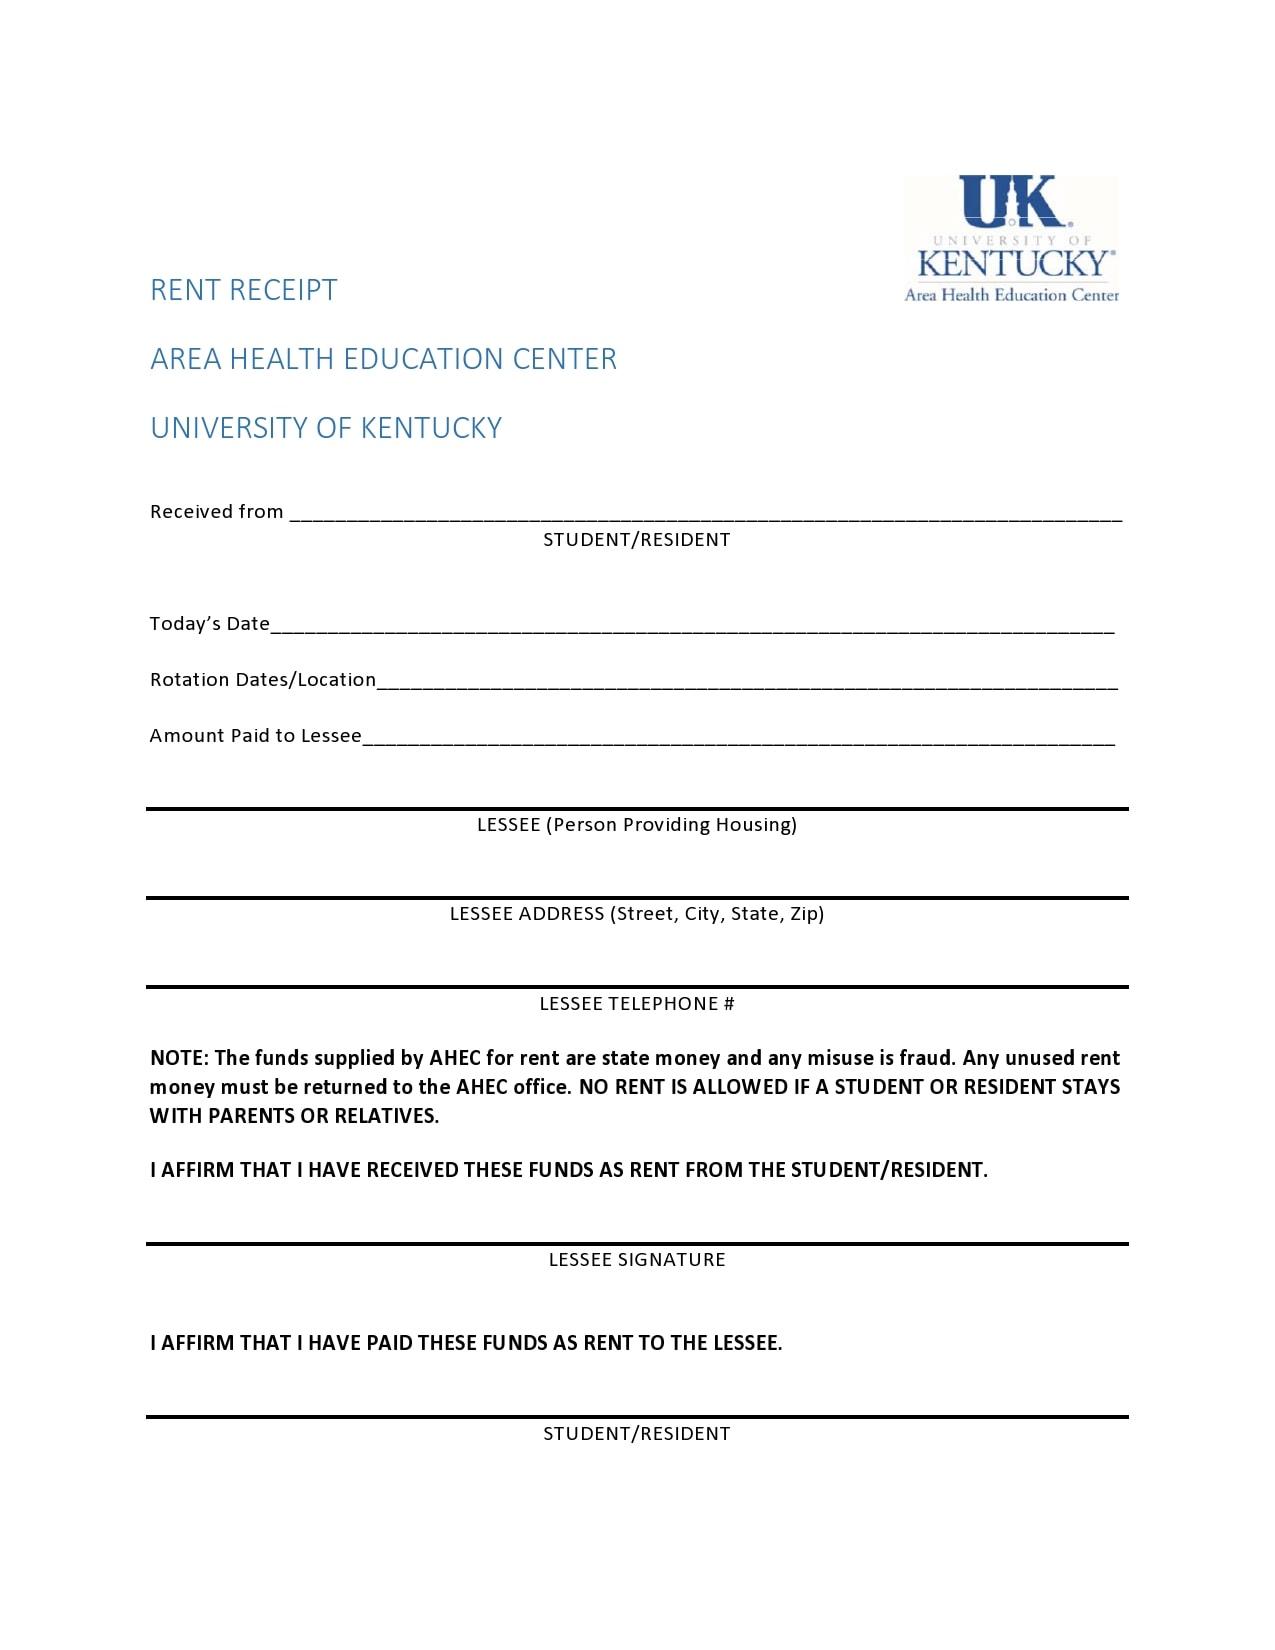 30 Printable Rent Receipt Templates [Word/PDF] - TemplateArchive